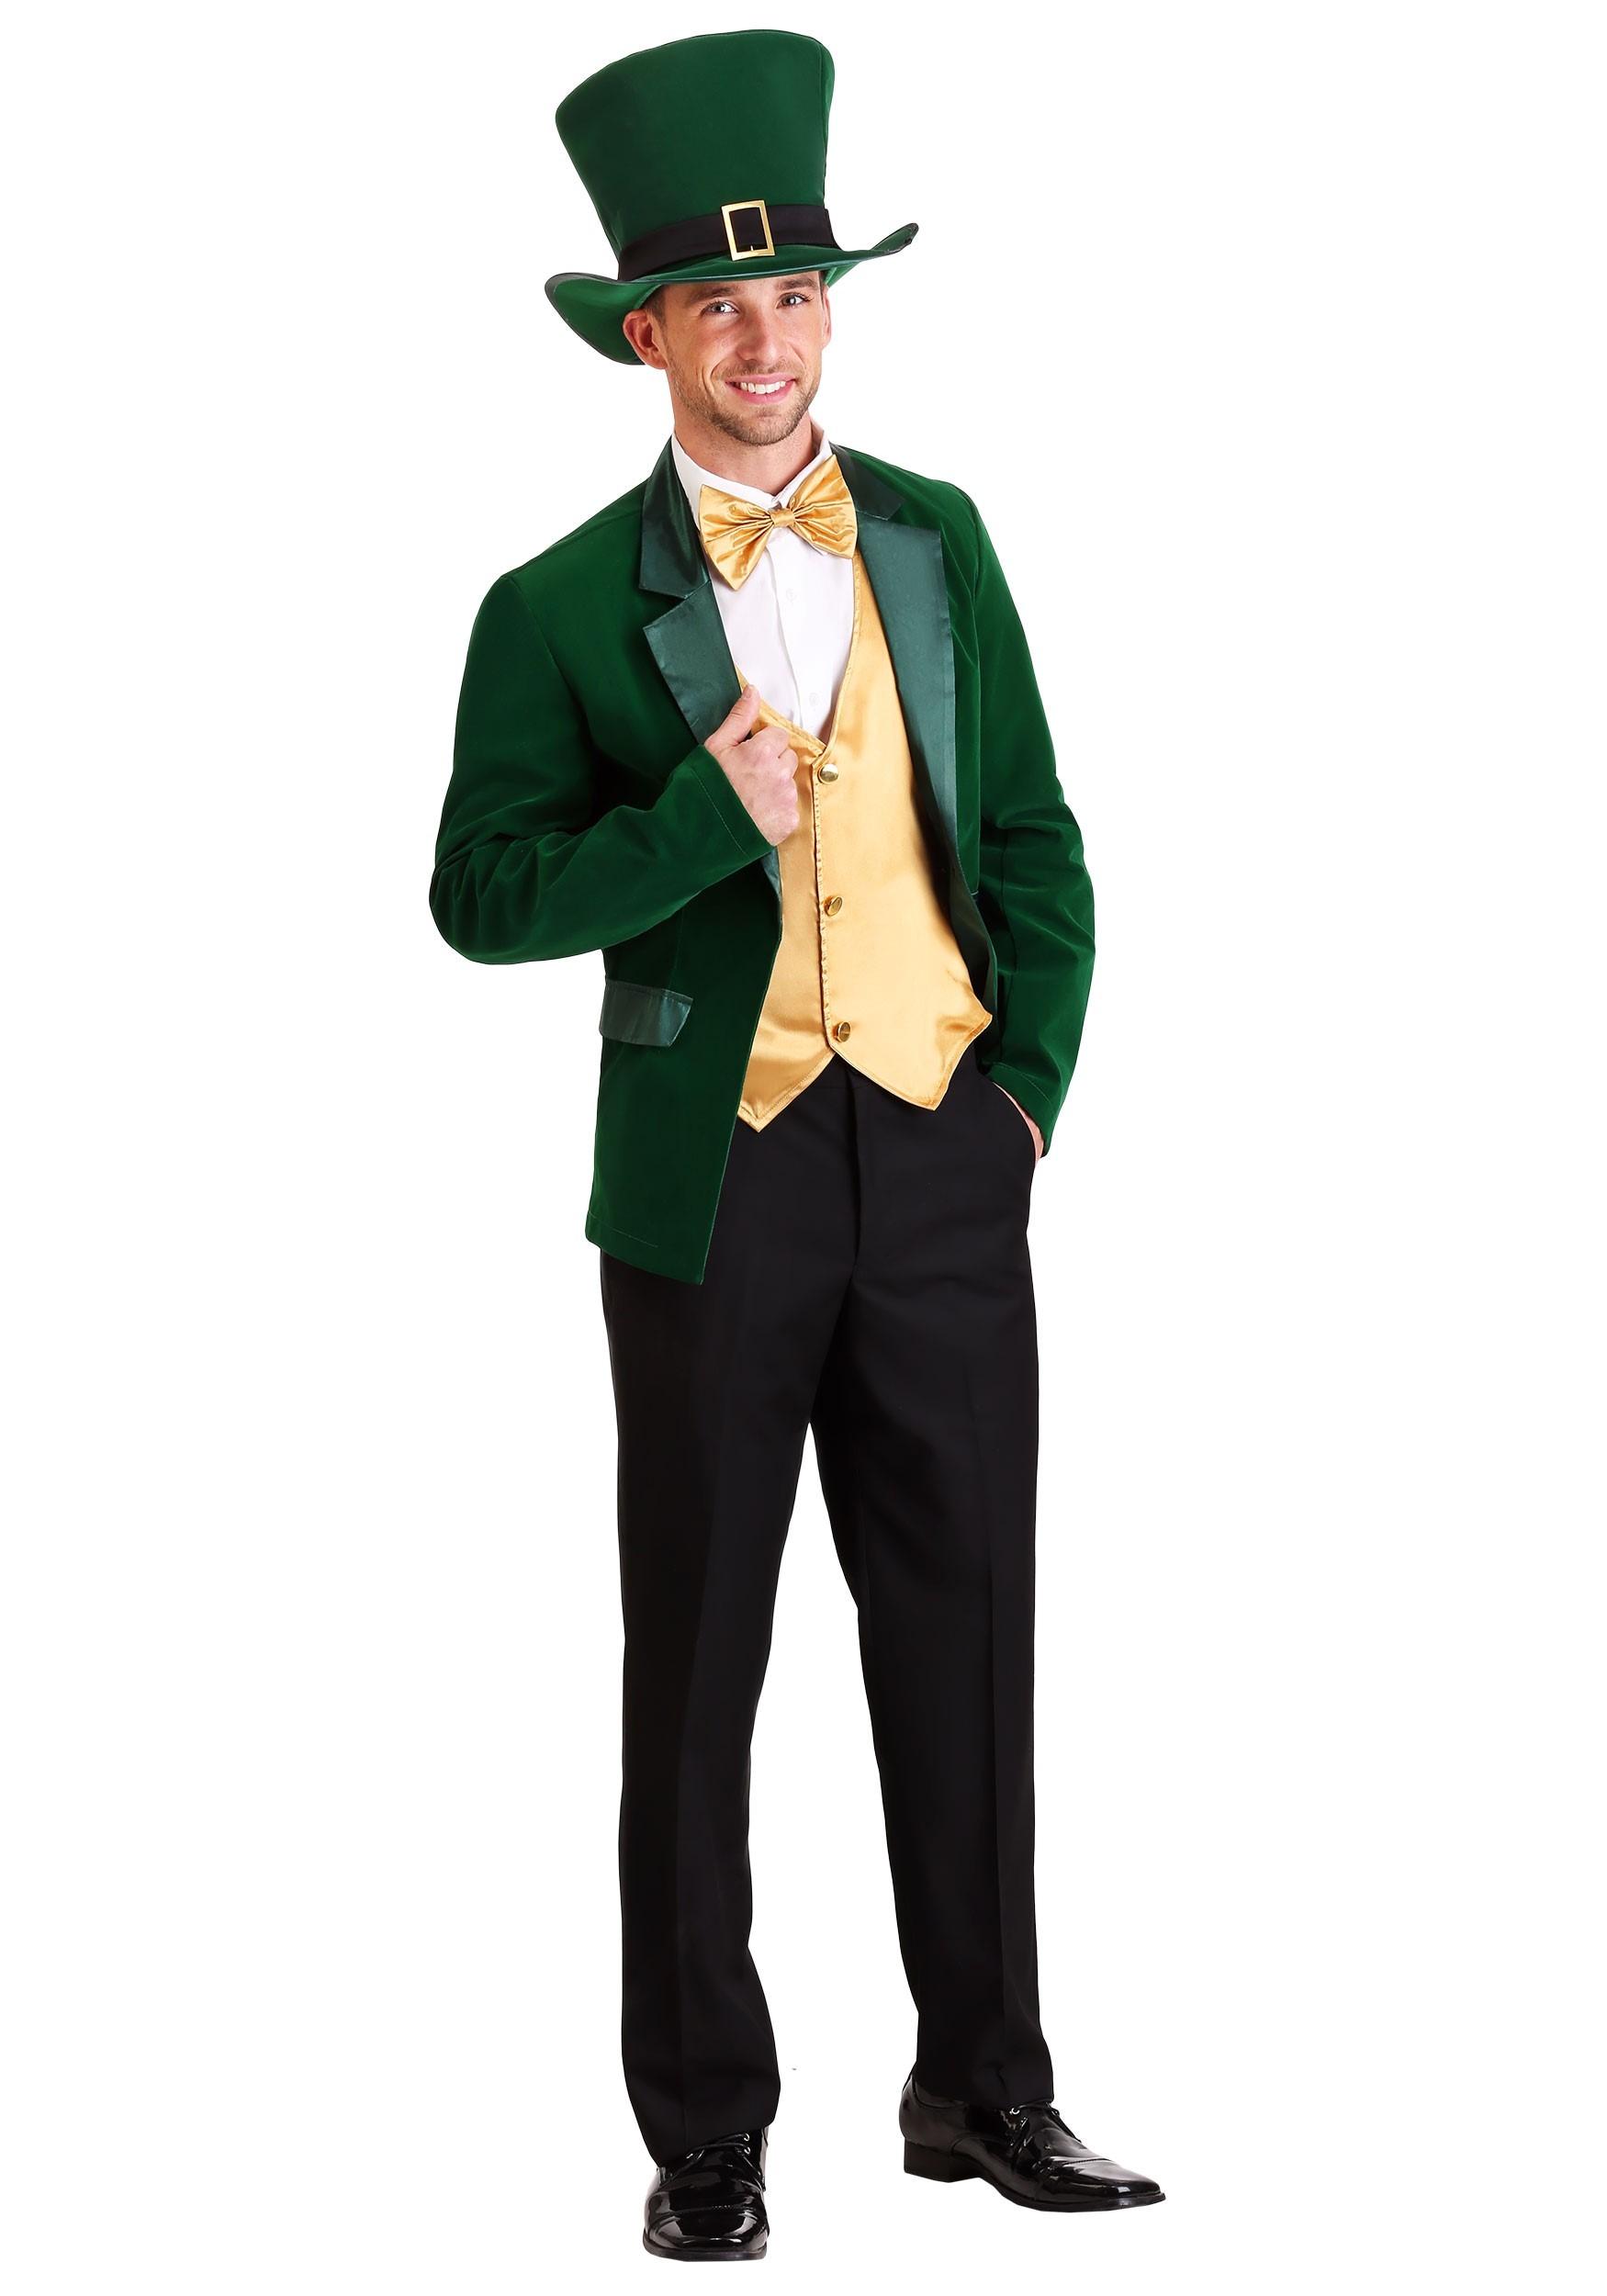 Gold and Green Leprechaun Costume for Men